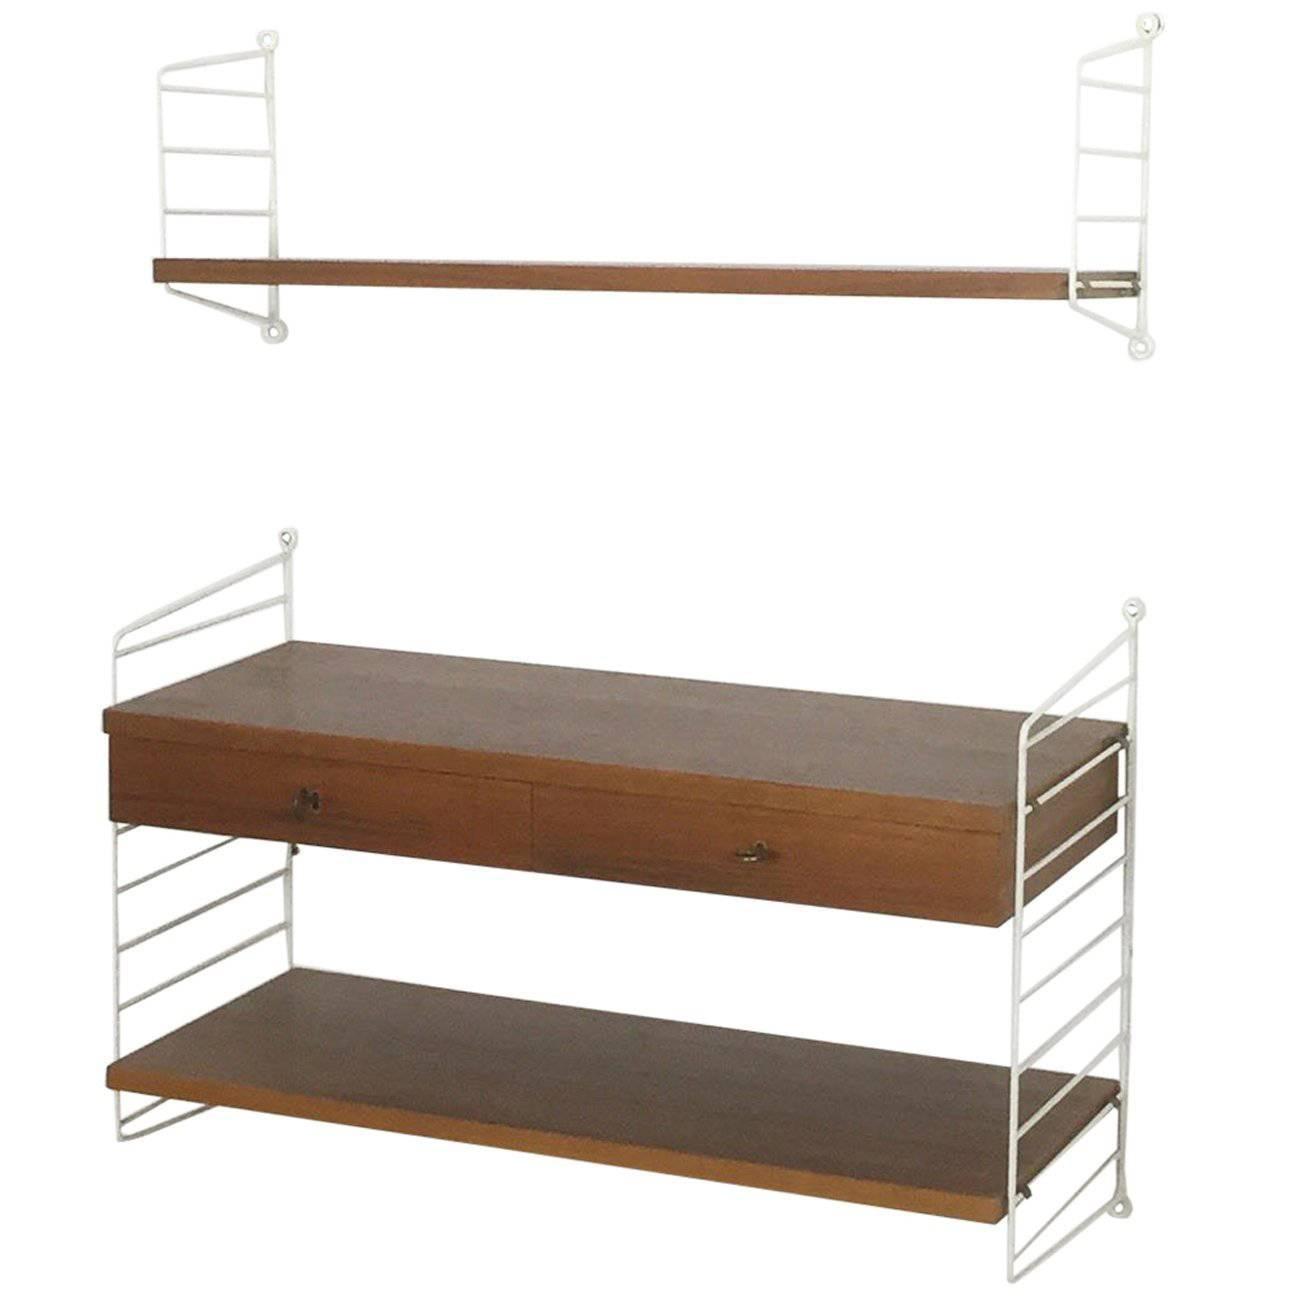 Antique Furniture String Shelf Nisse Wall Shelf 1960s 70s Shelf System 3 Flat